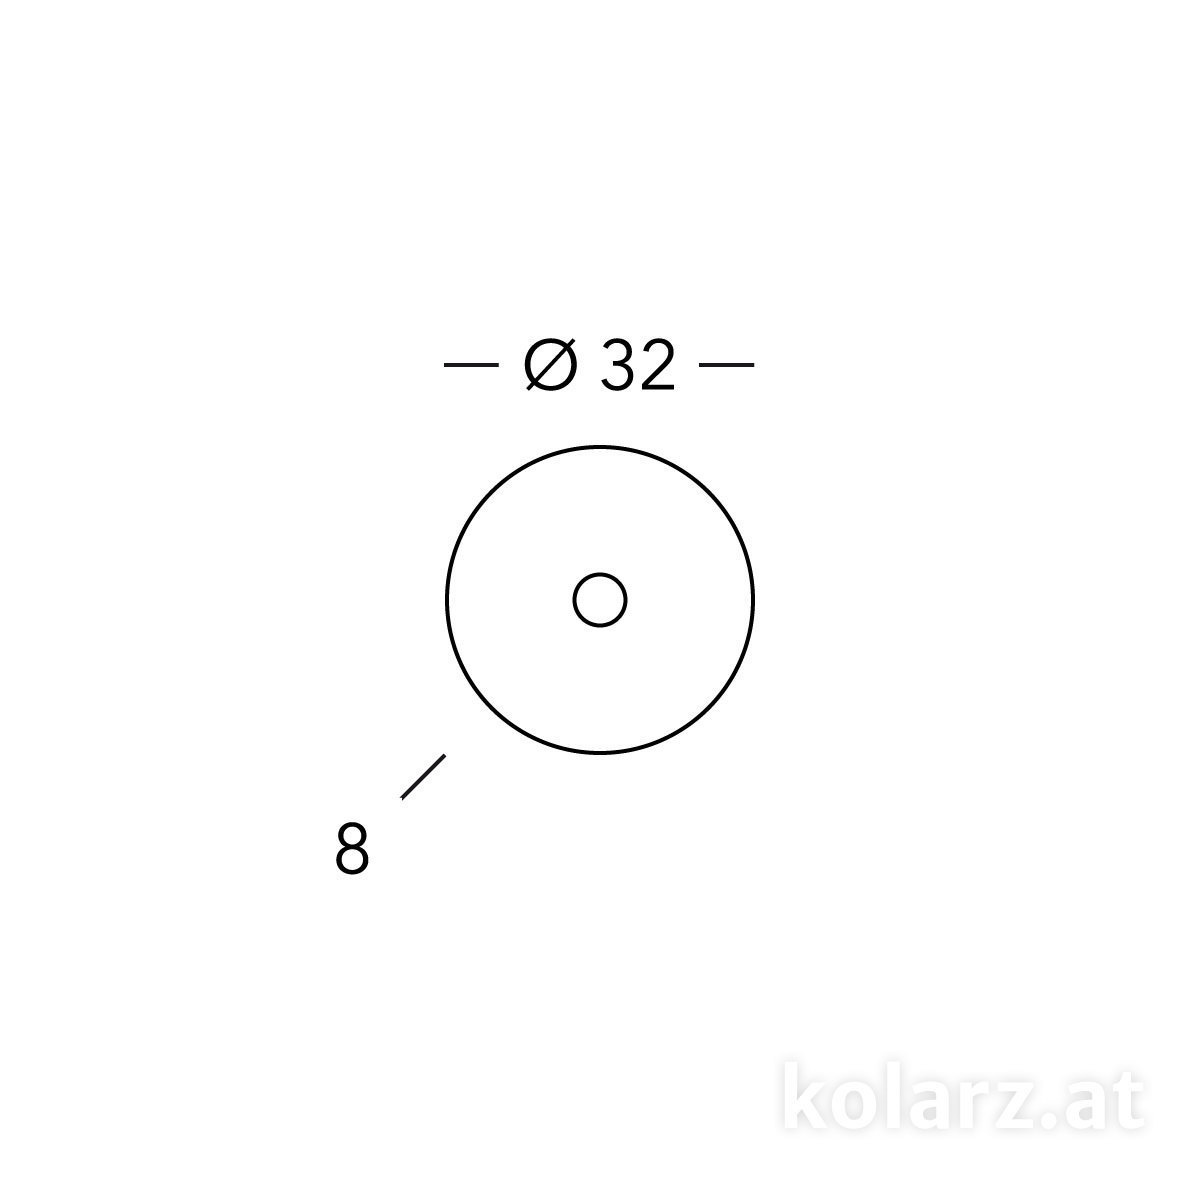 0314-U12-4-W-s1.jpg